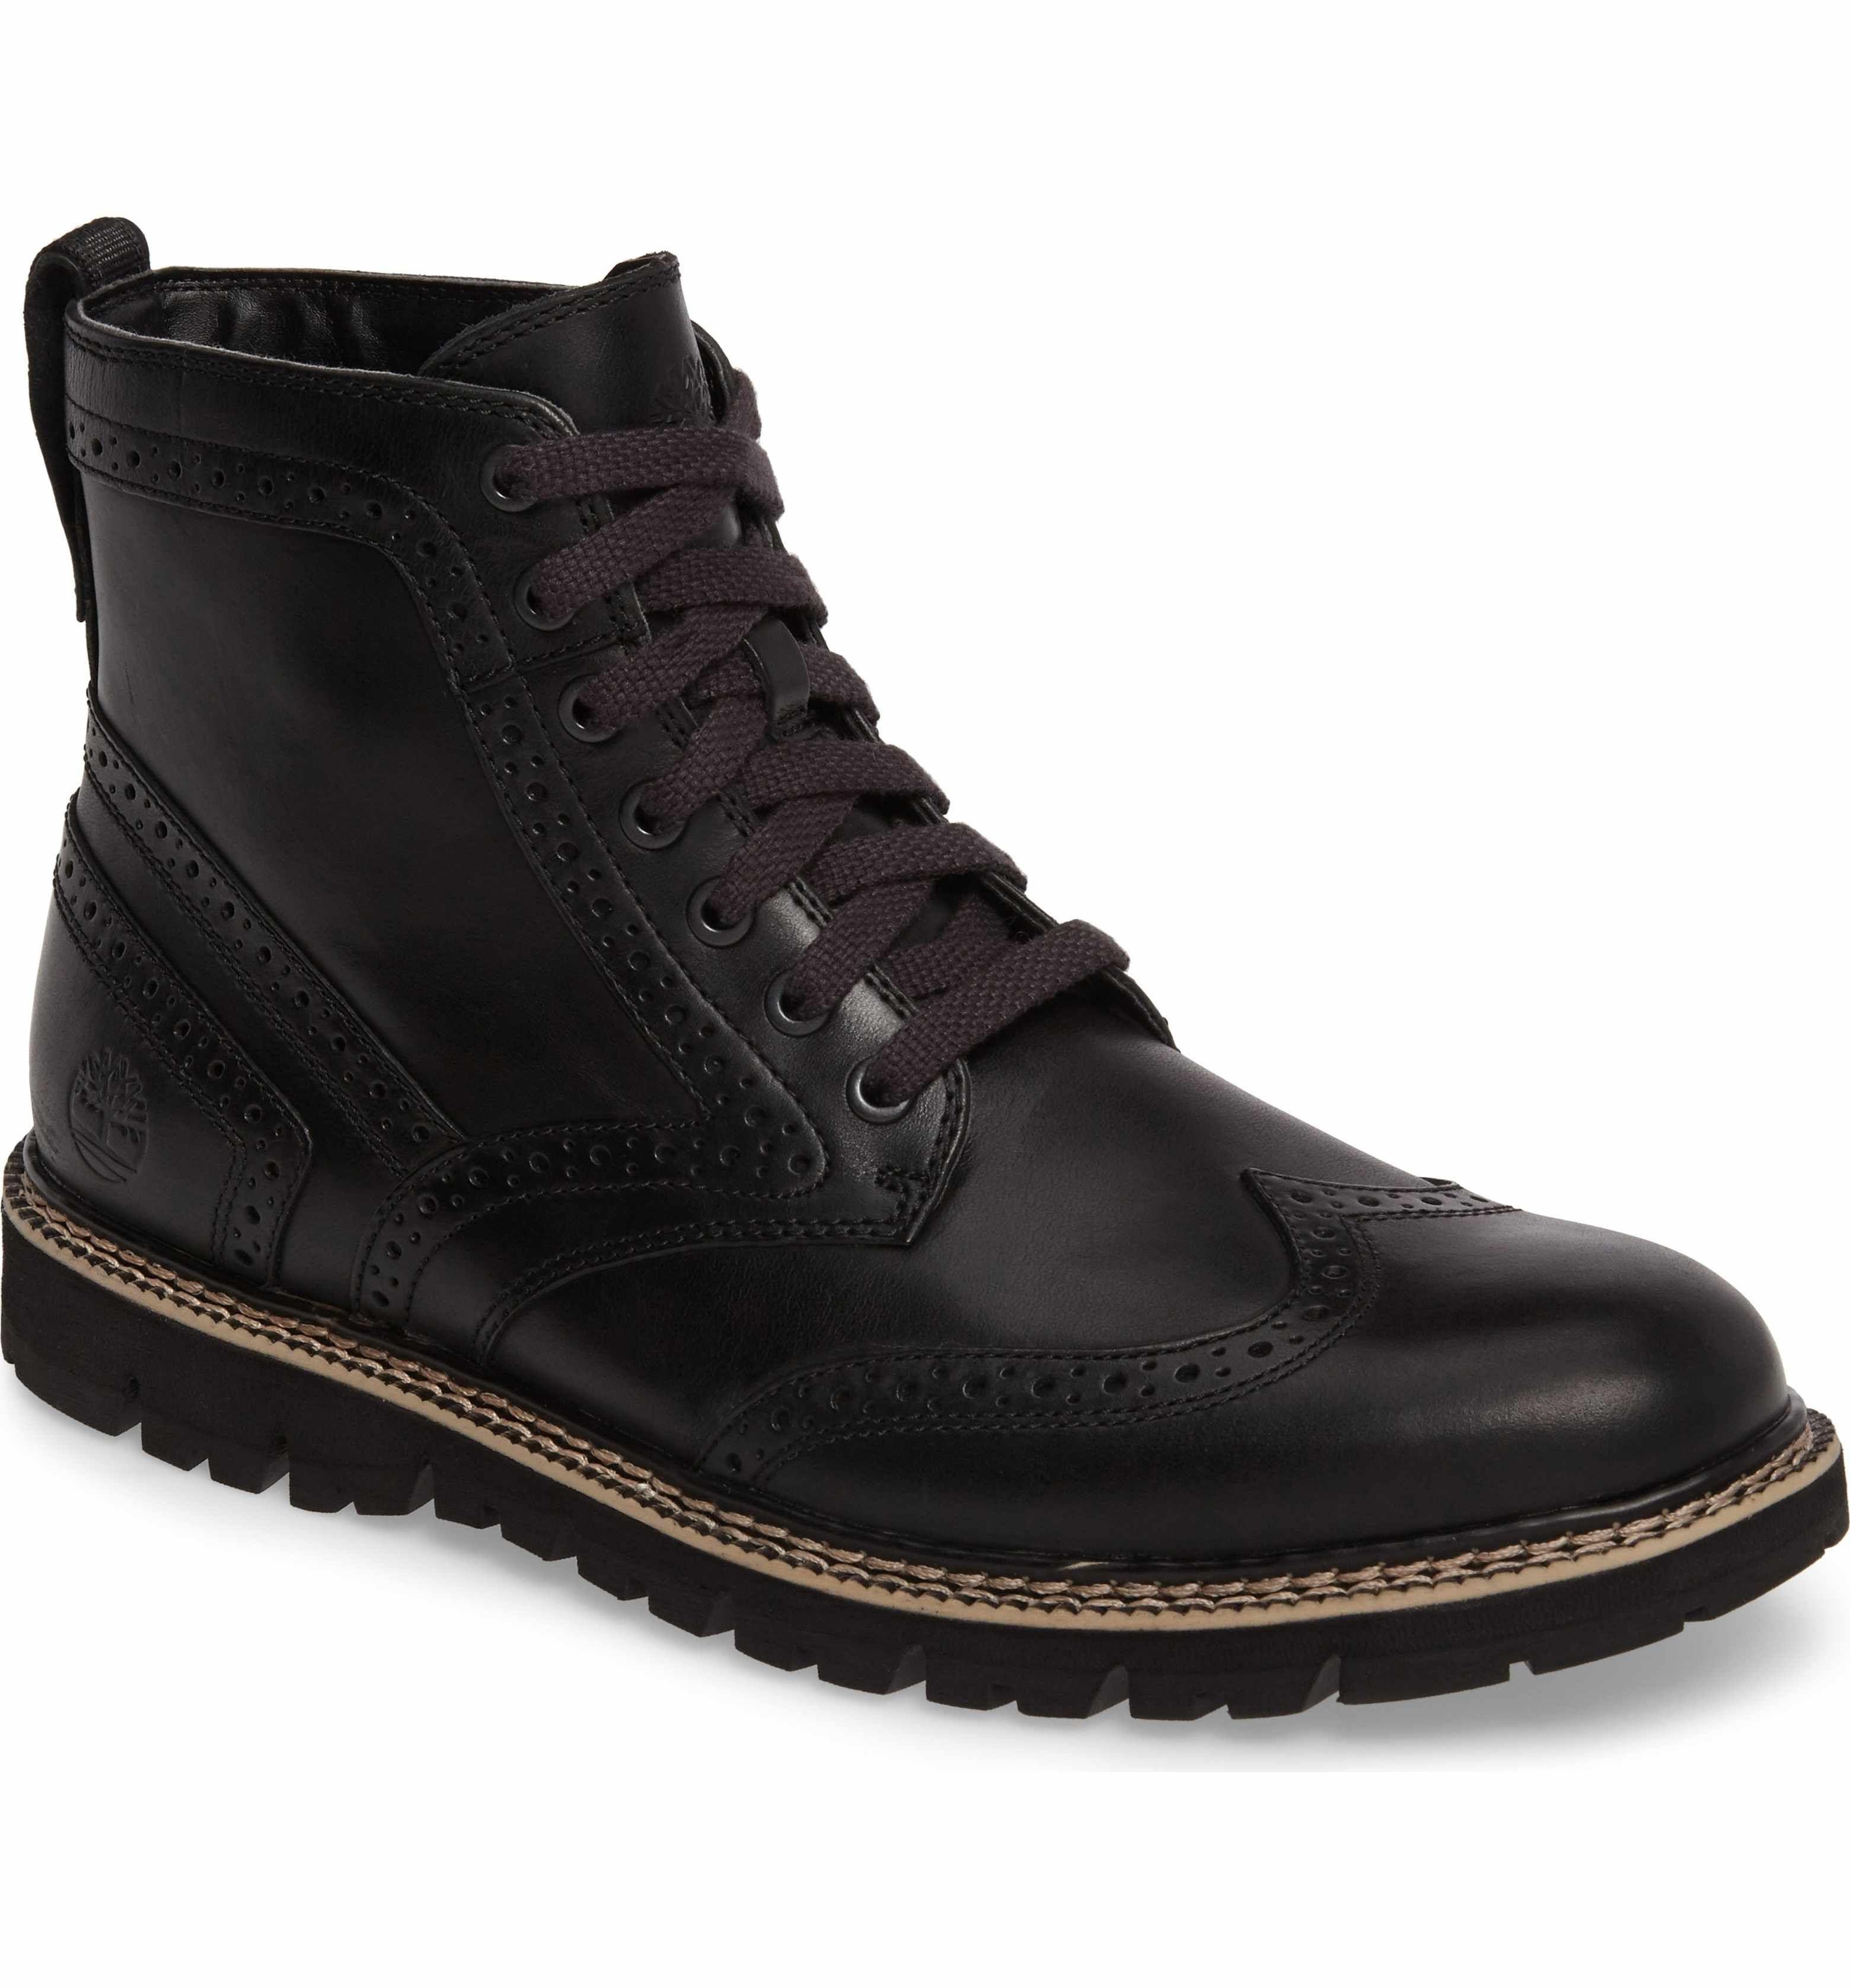 e01bef15fea Main Image - Timberland Britton Hill Wingtip Boot (Men)   Men's ...